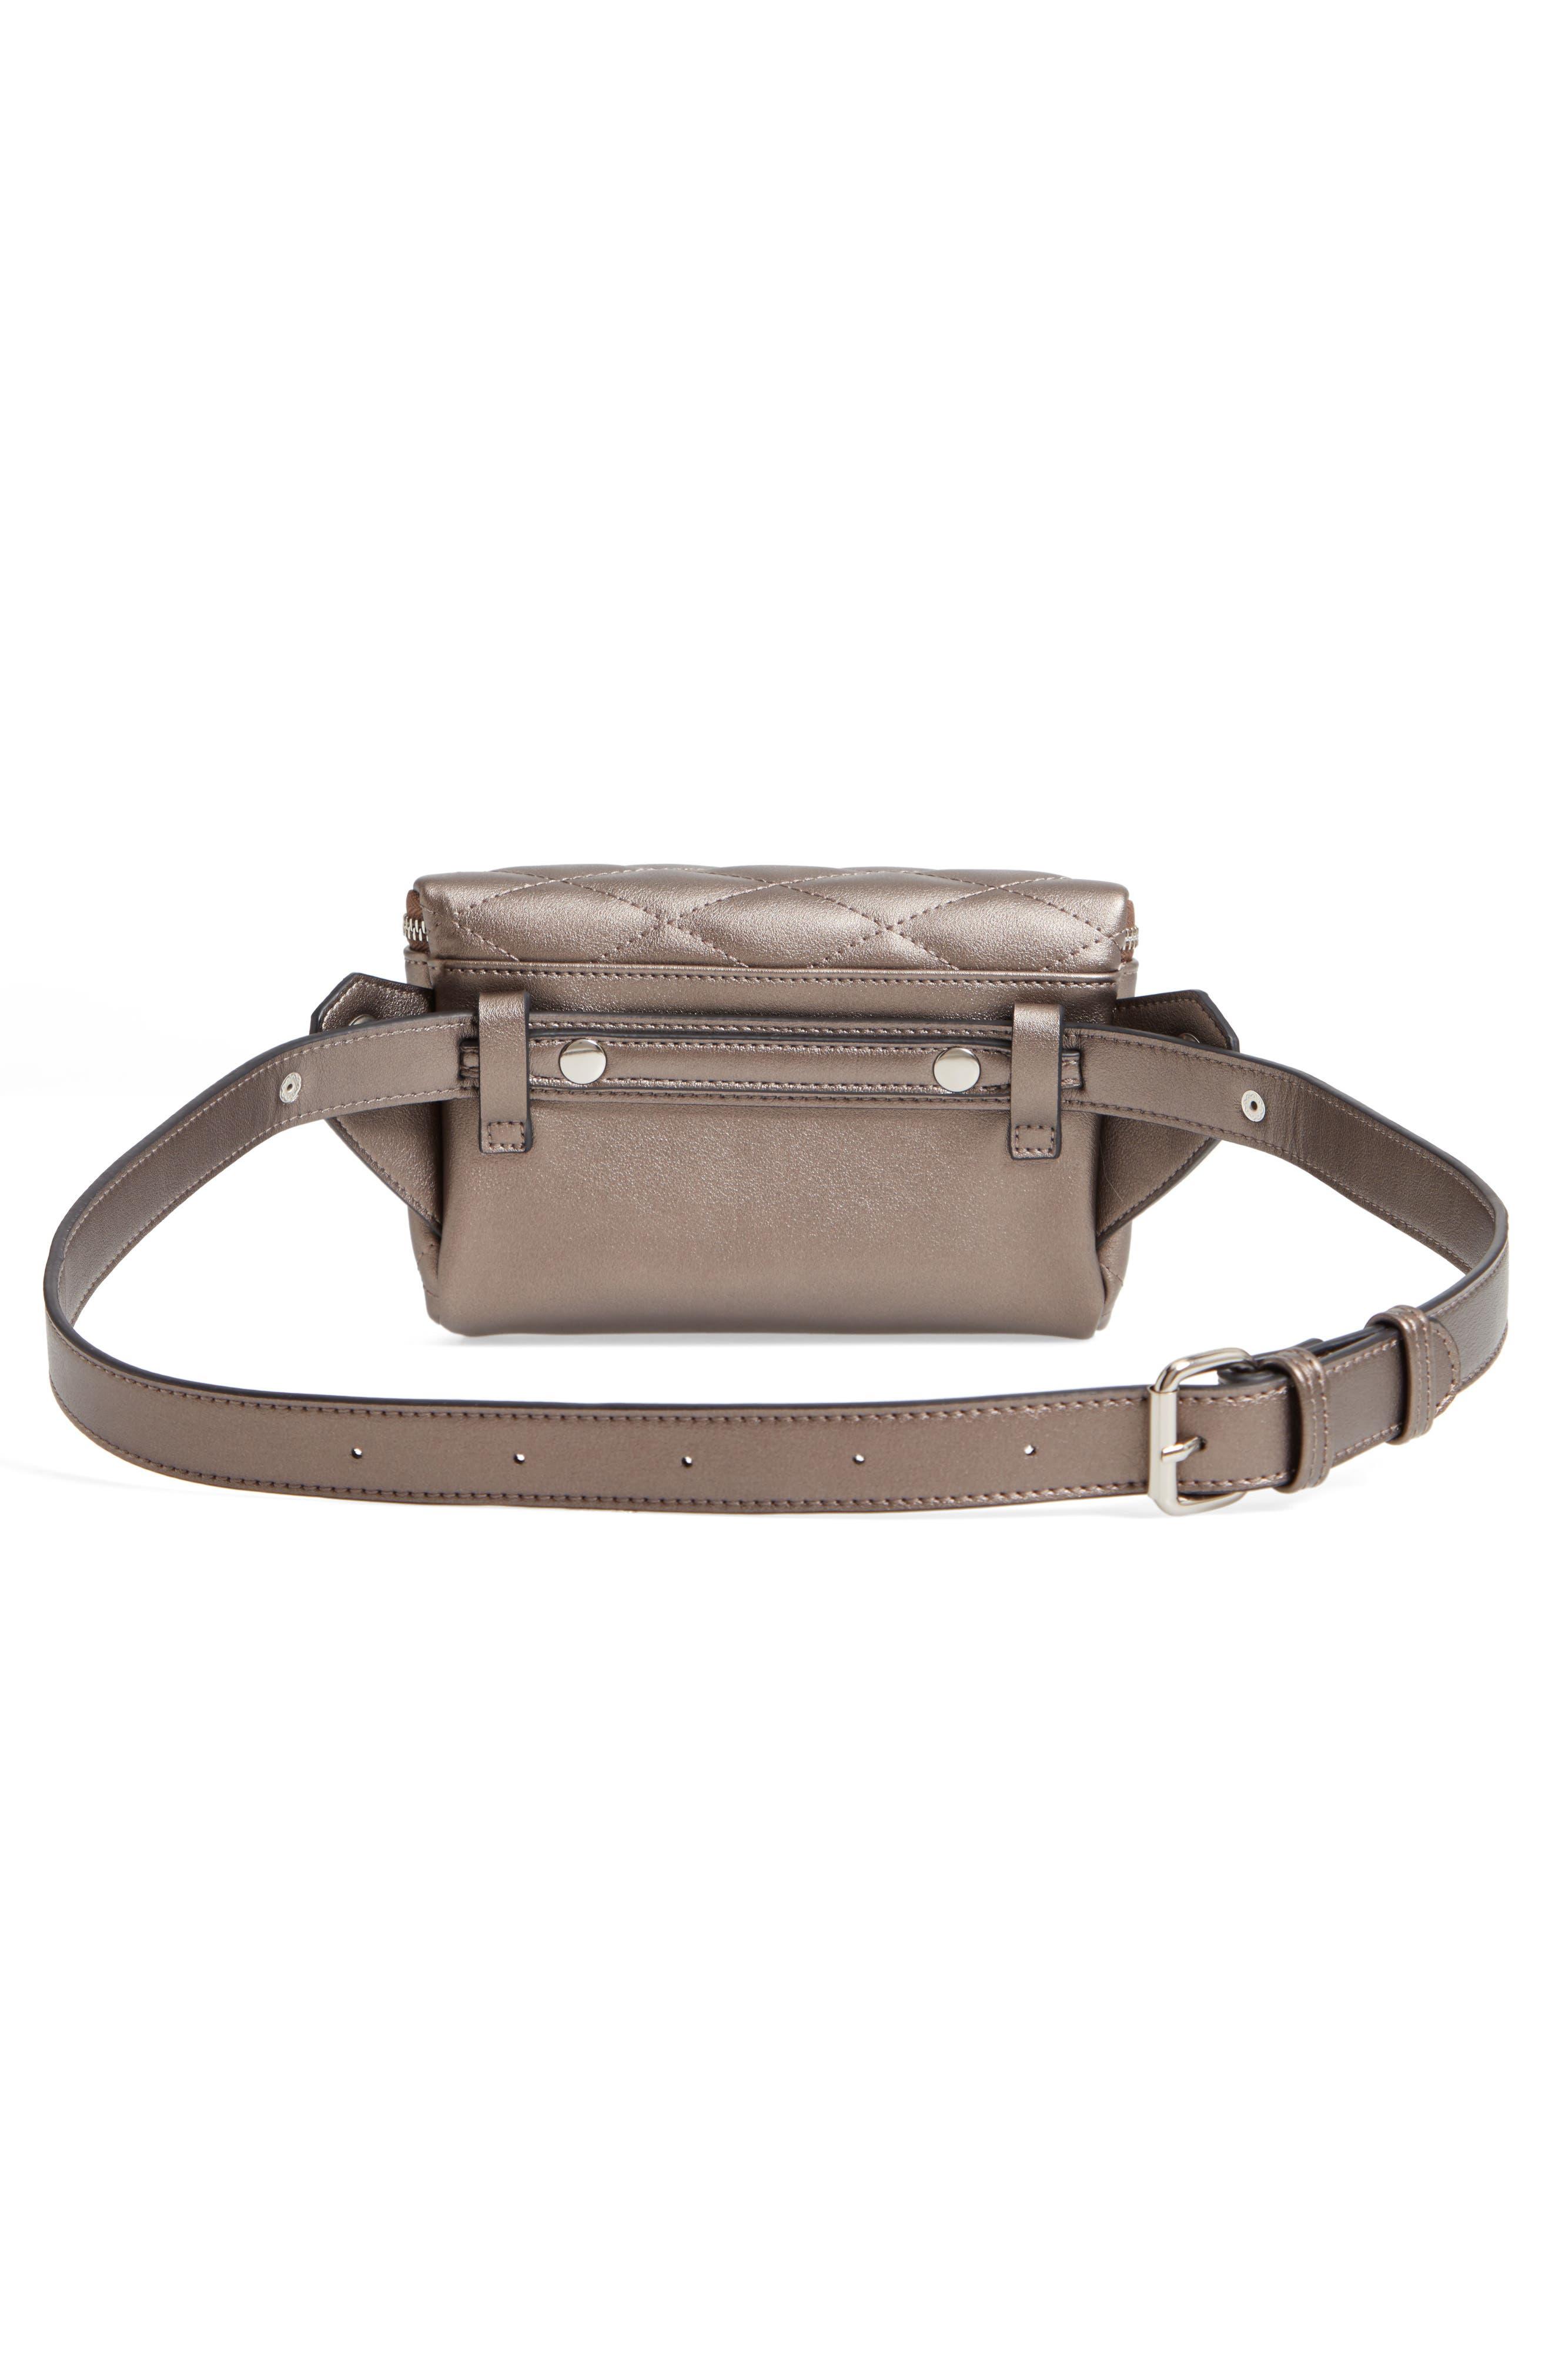 MALI + LILI,                             Faye Vegan Leather Quilted Belt Bag,                             Alternate thumbnail 4, color,                             PEWTER